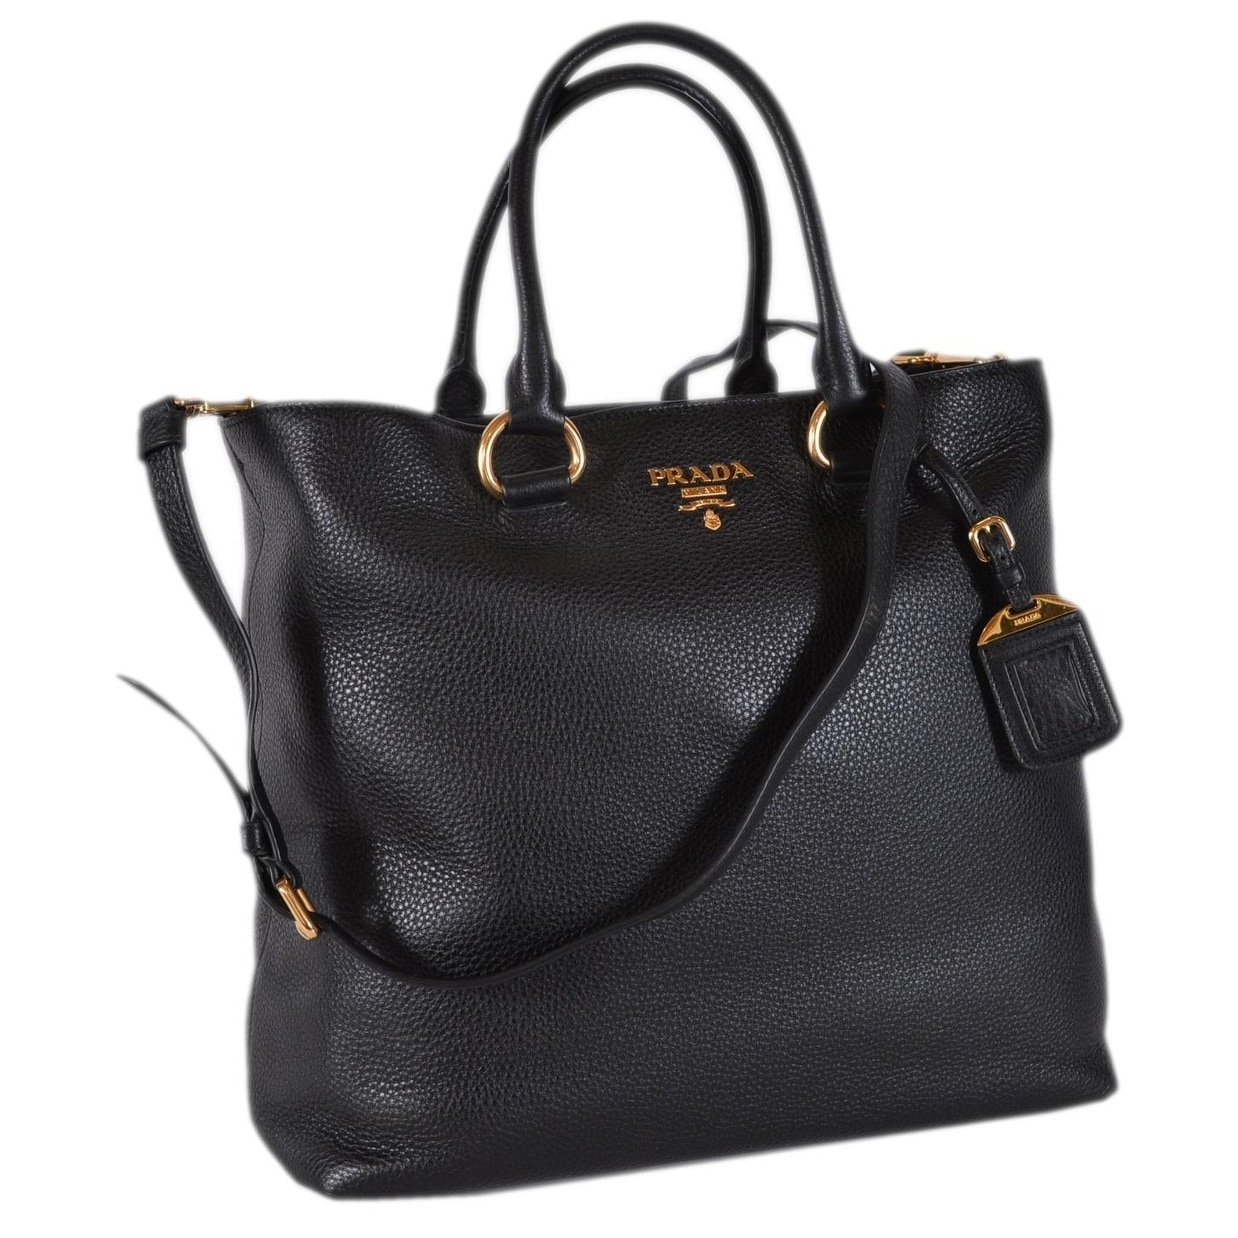 f38e35eaf4c3 Prada Designer Handbags | Find Great Designer Store Deals Shopping at  Overstock